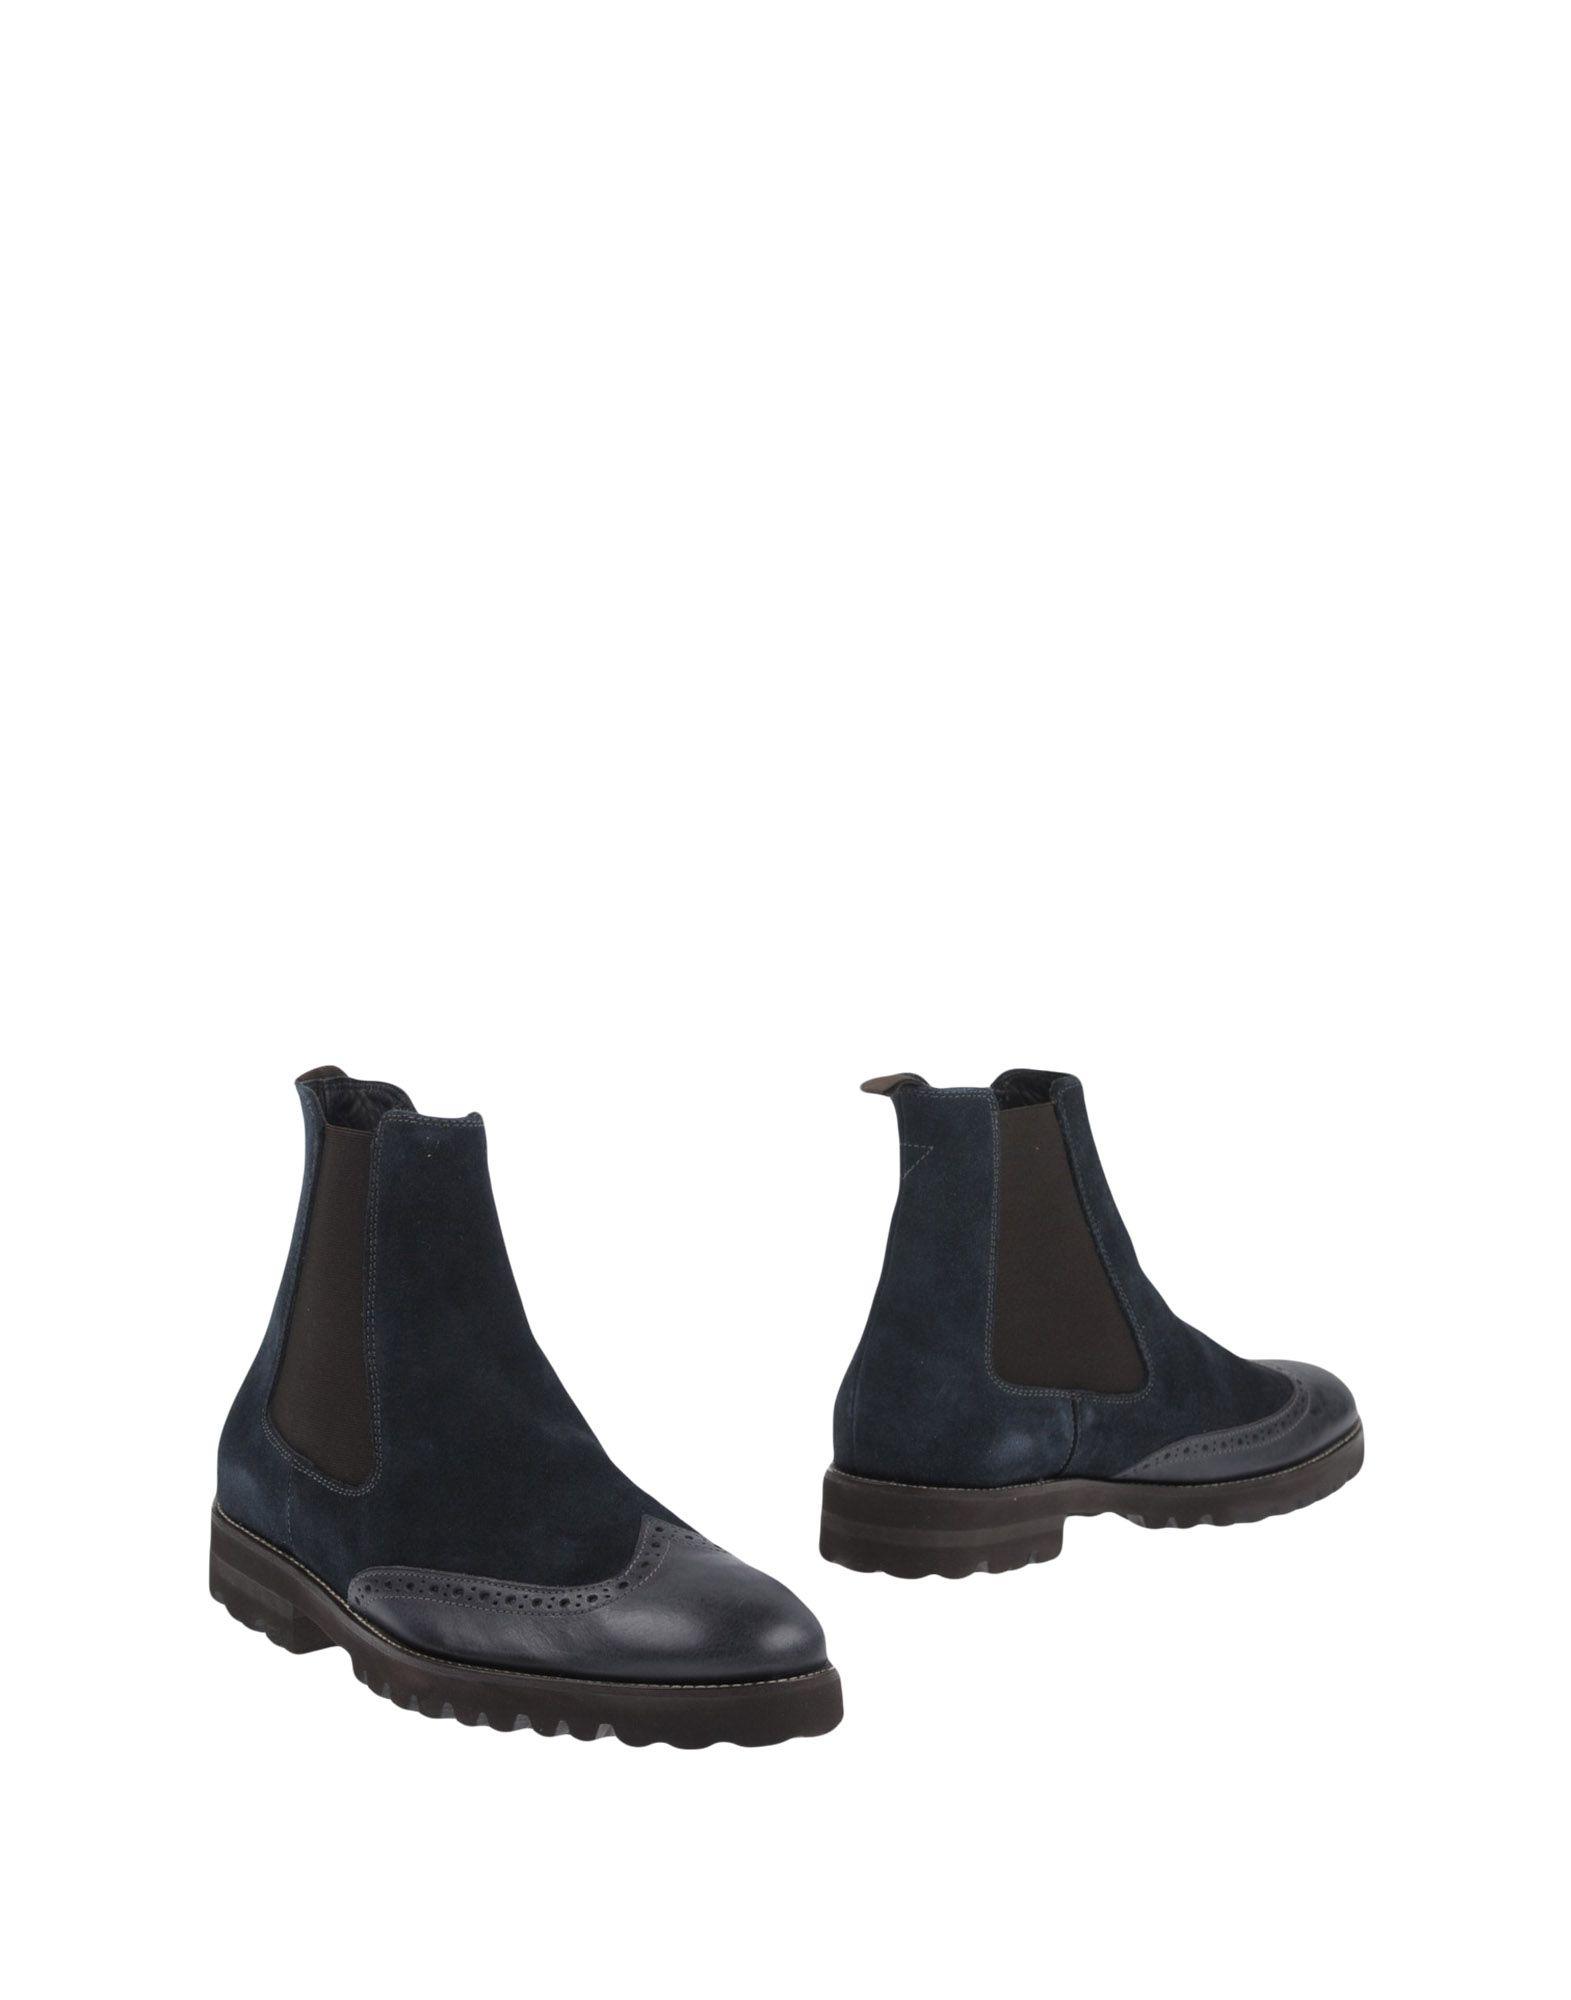 SWAMP Полусапоги и высокие ботинки magazzini del sale полусапоги и высокие ботинки